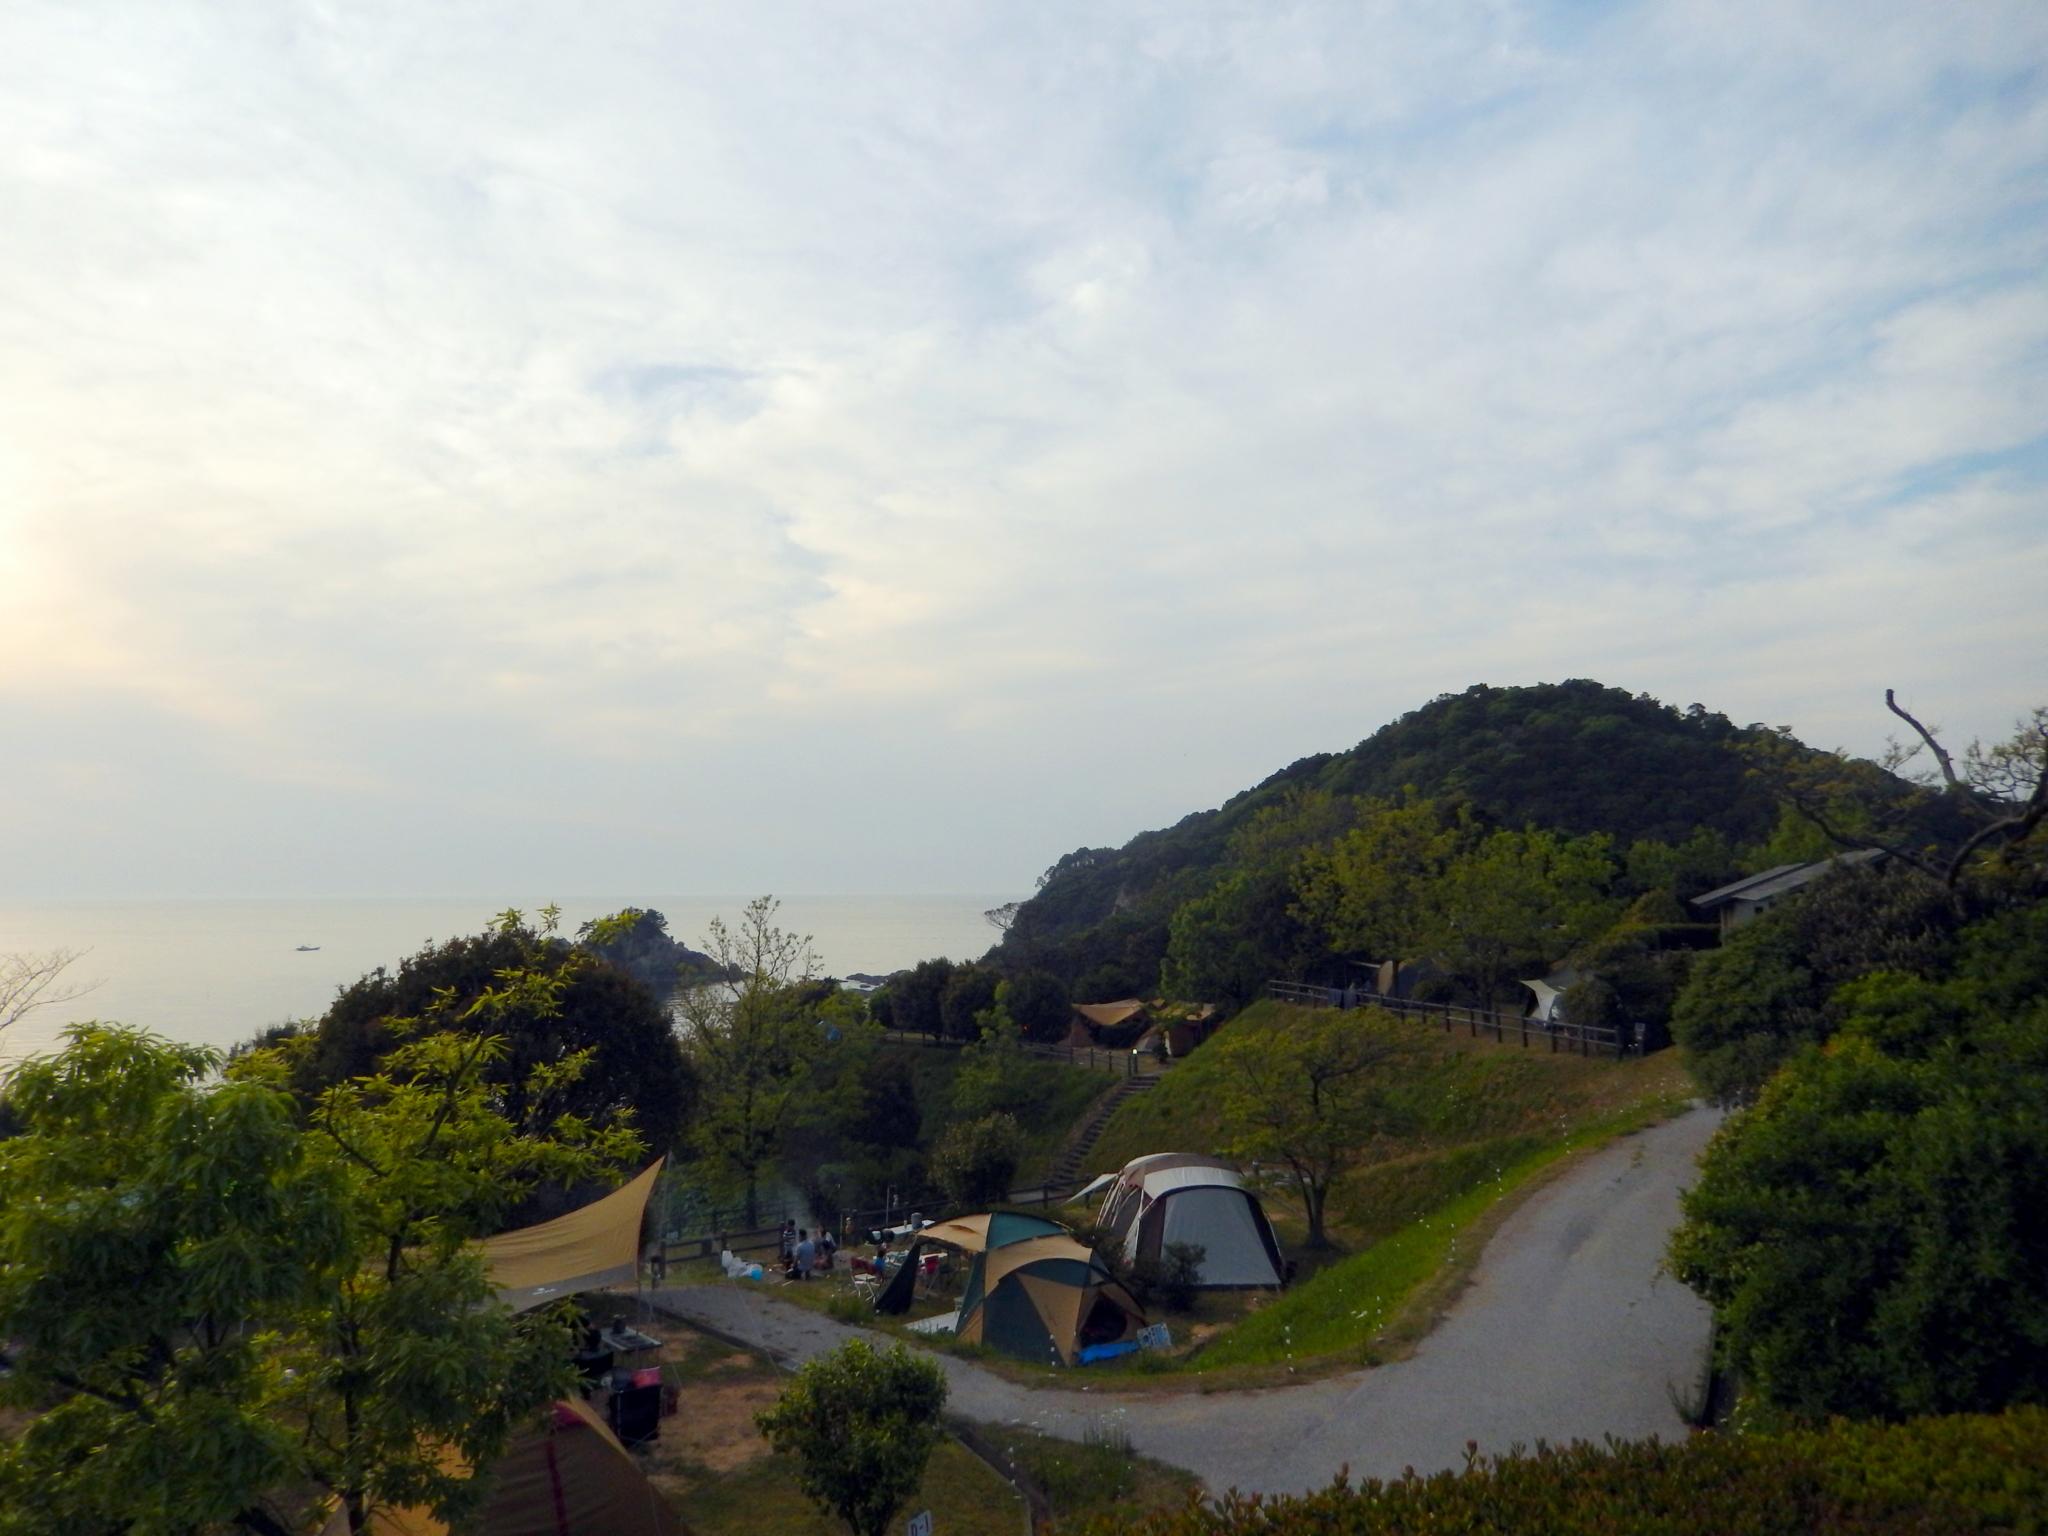 f:id:ToshUeno:20150502181837j:plain